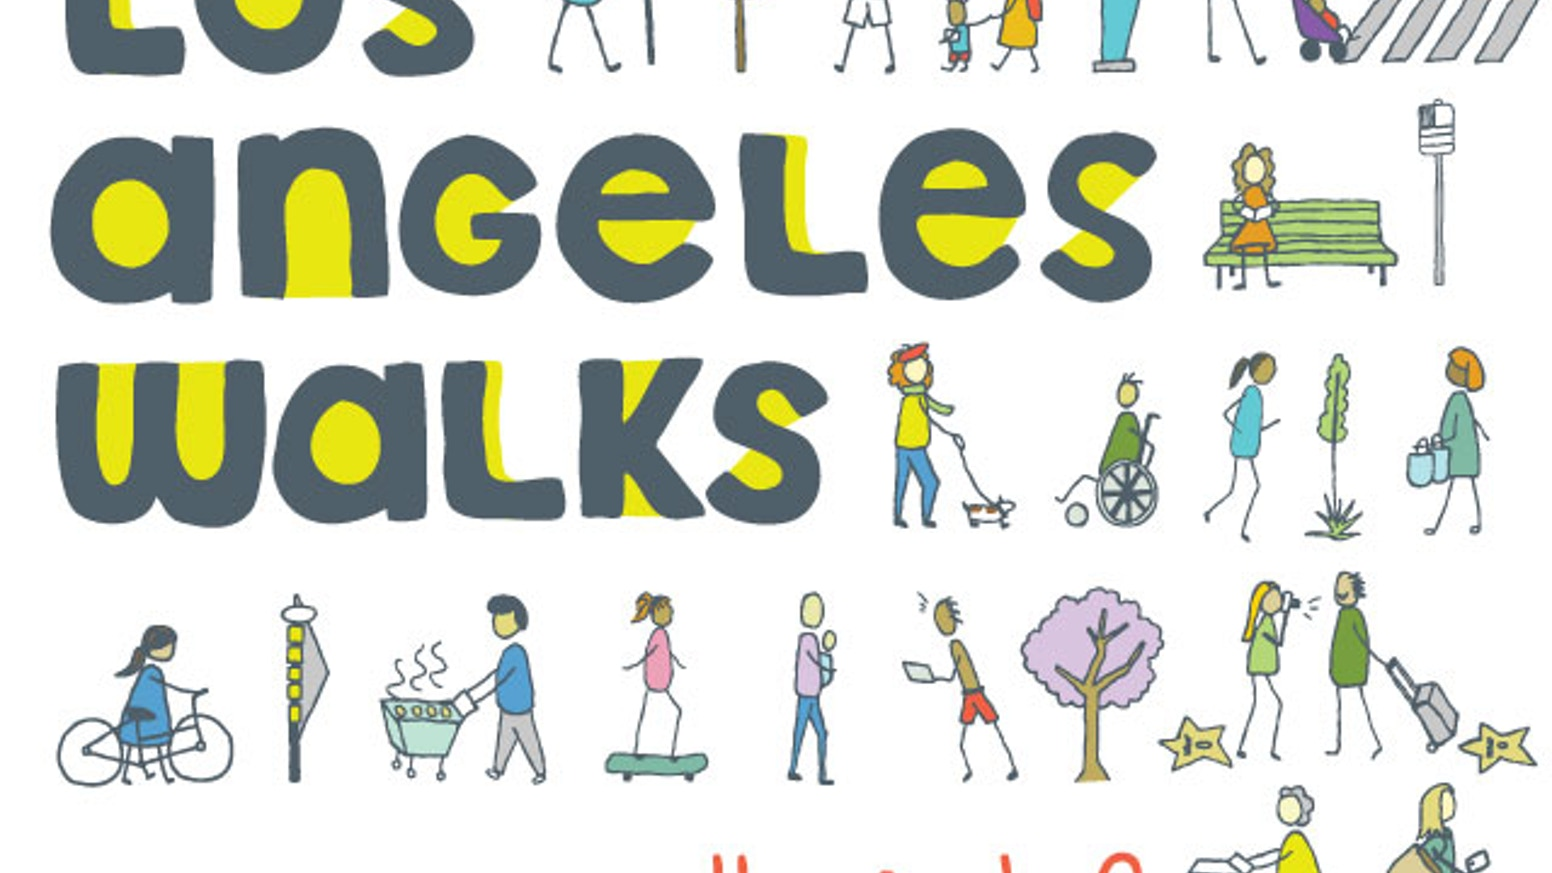 Hey I M Walking Here By Los Angeles Walks Kickstarter